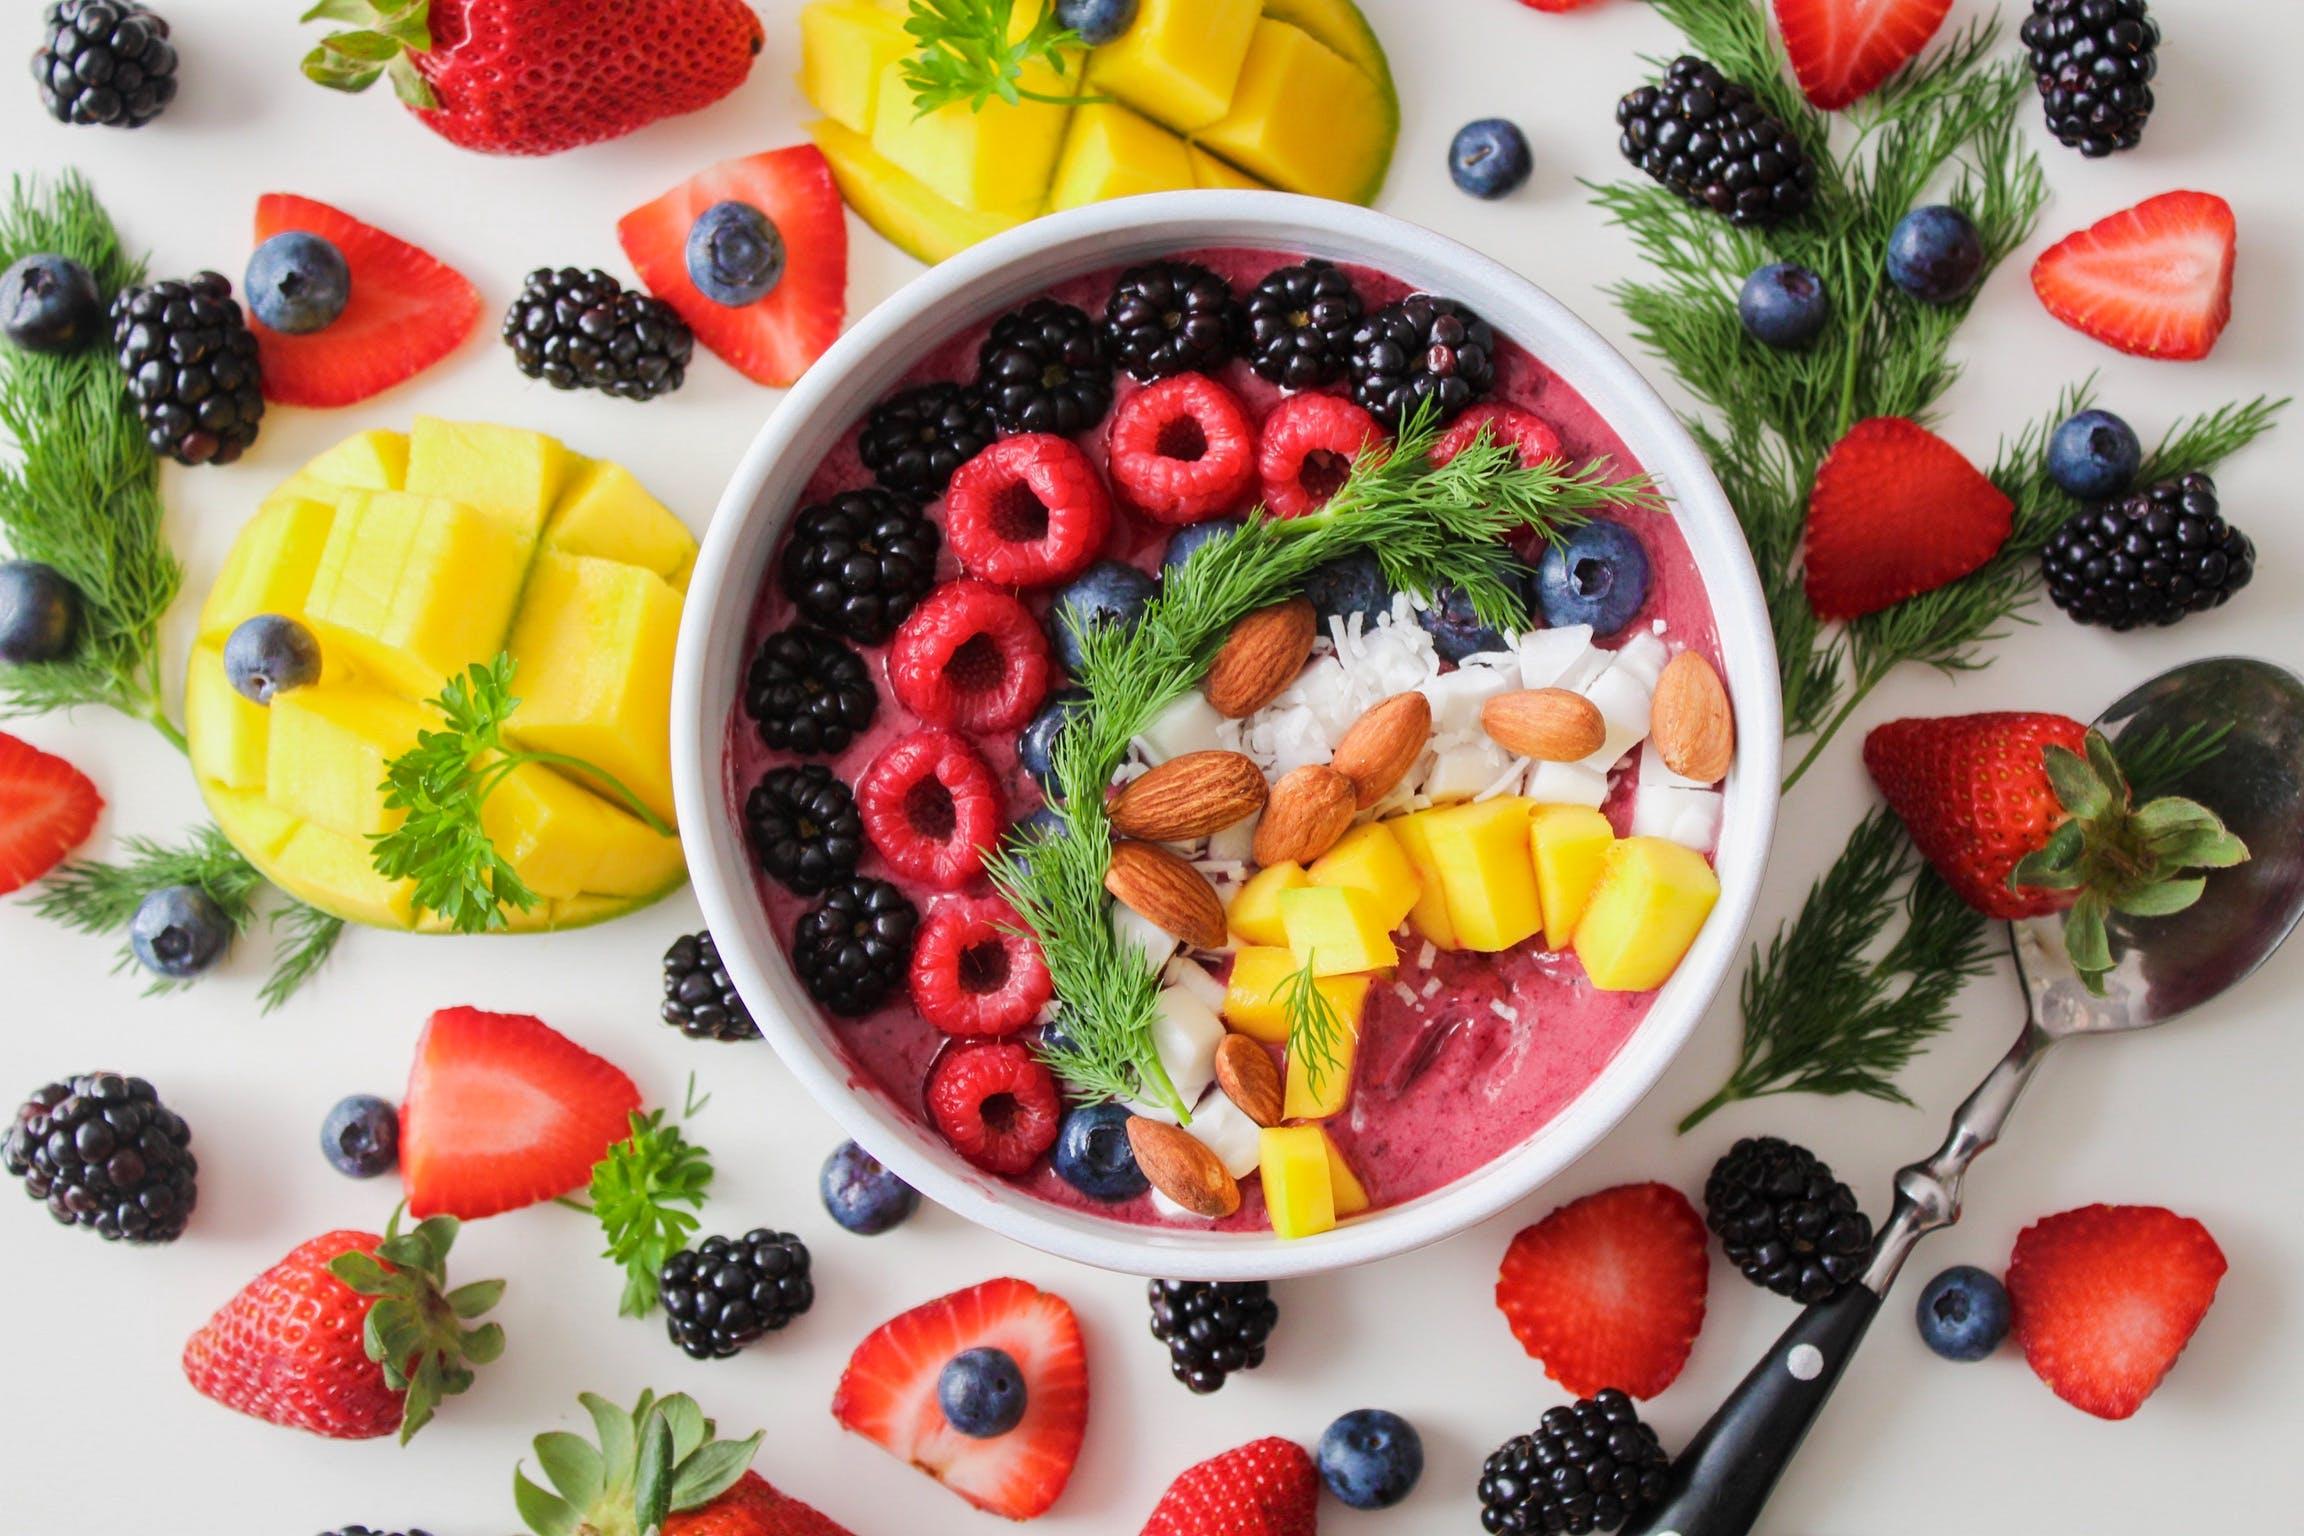 Fotos de stock gratuitas de Almendras, arándanos azules, blackberries, bol